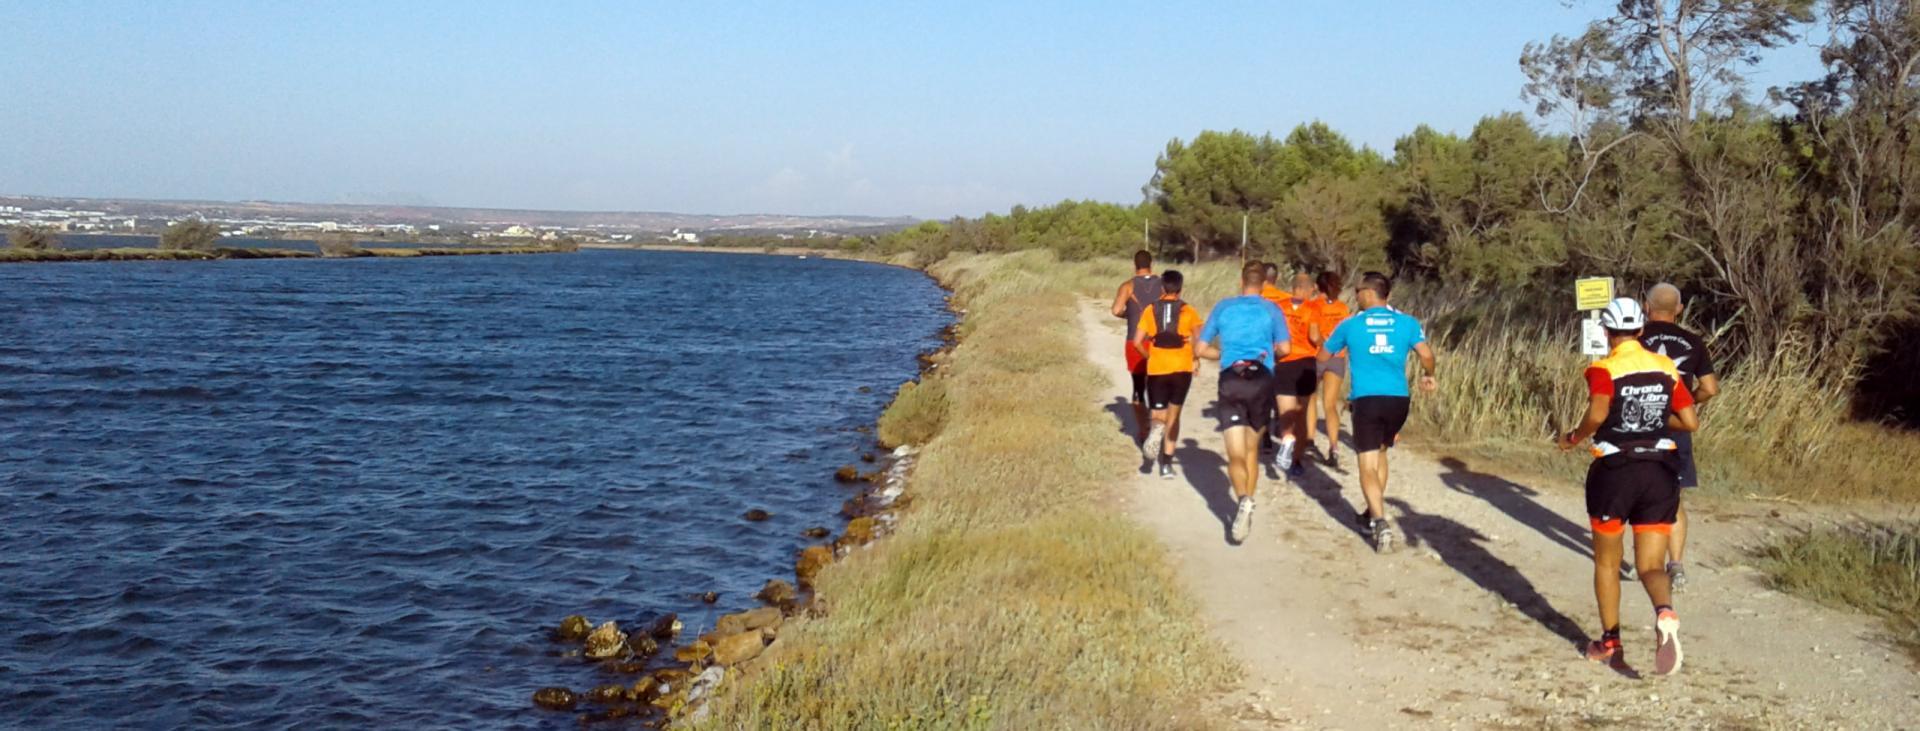 Bienvenue au Chrono Libre, club running/trail adultes à Châteauneuf-les-Martigues (13)